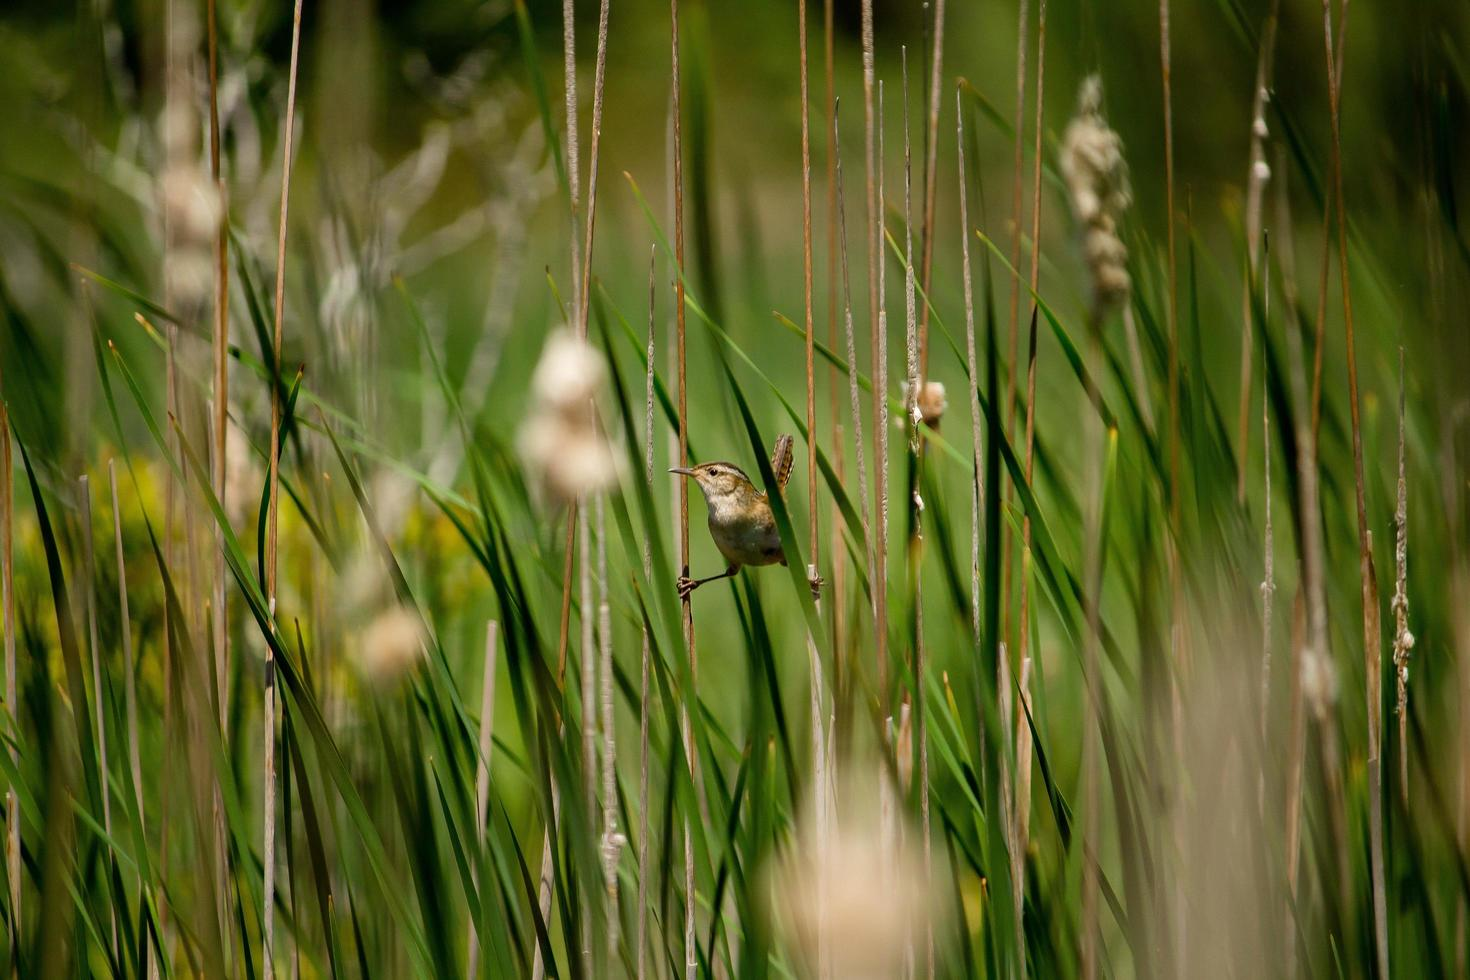 vogel zat op planten foto